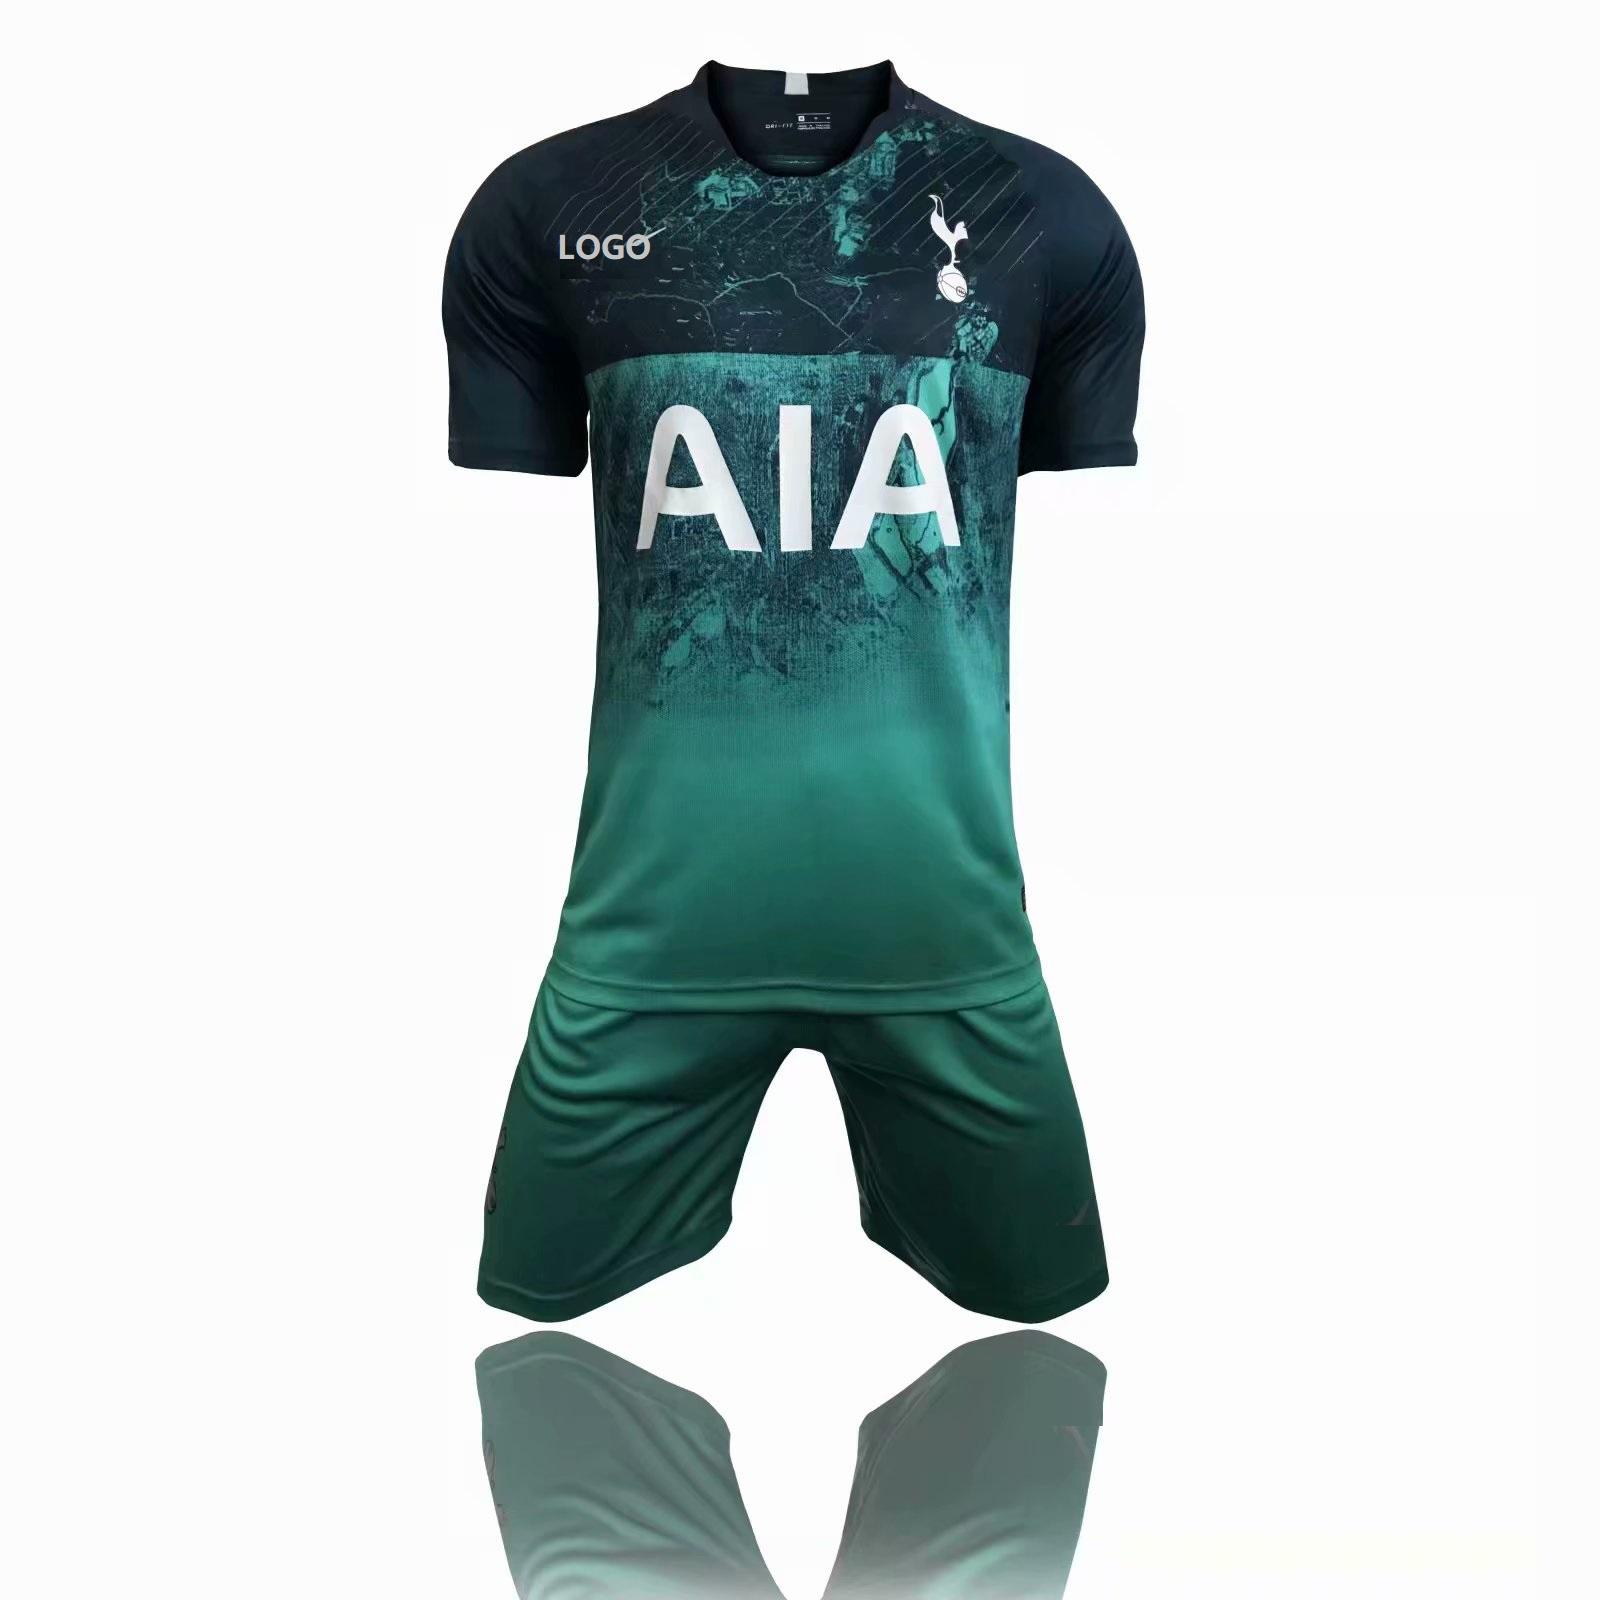 b59a455bf2c 2018 19 Adult Hotspur Green Third Away Soccer Jersey Uniform Men 3rd Football  Kits Custom Name Number